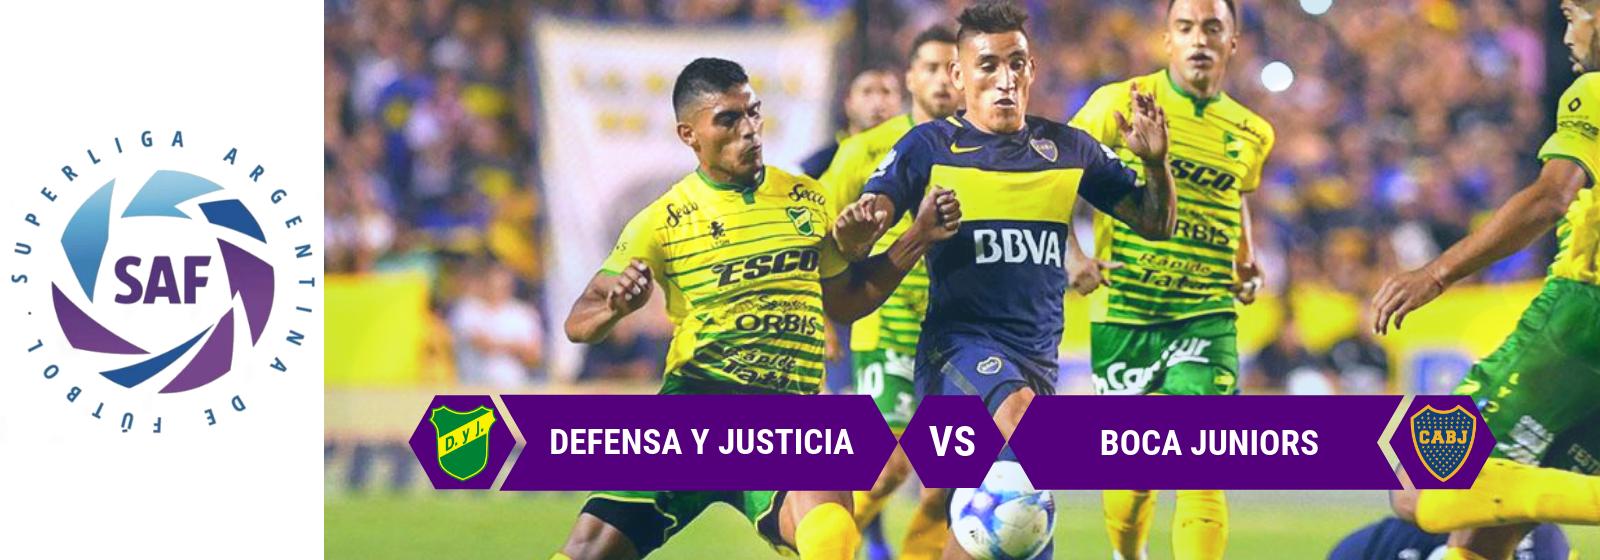 Argentina Primera Division Defensa y Justicia vs Boca Picks